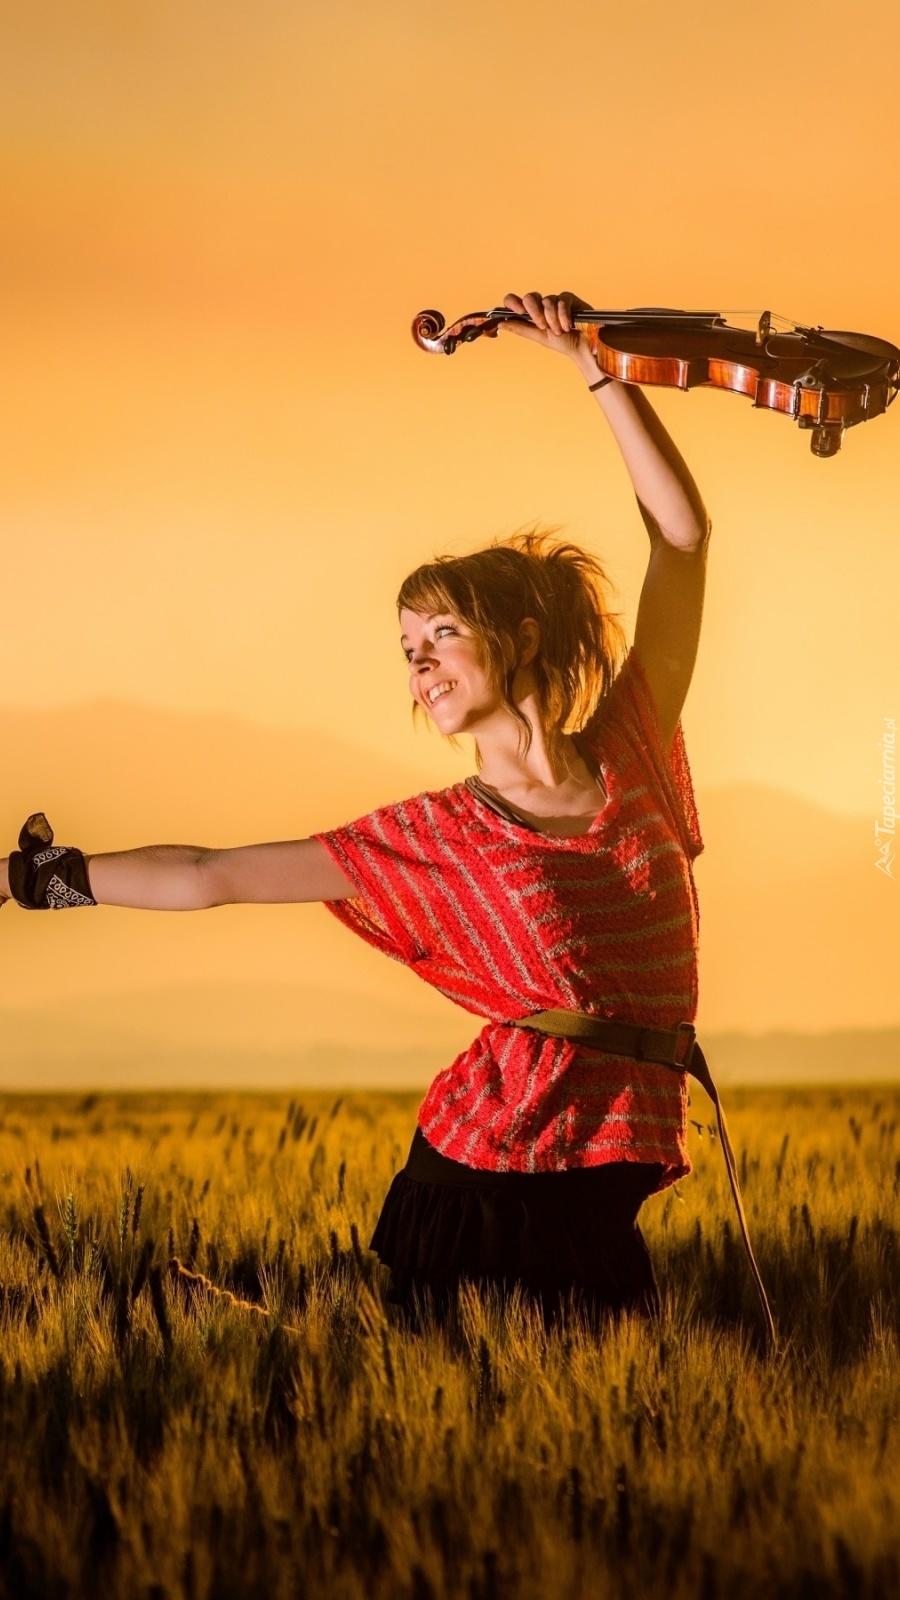 Lindsey Stirling ze skrzypcami na polu